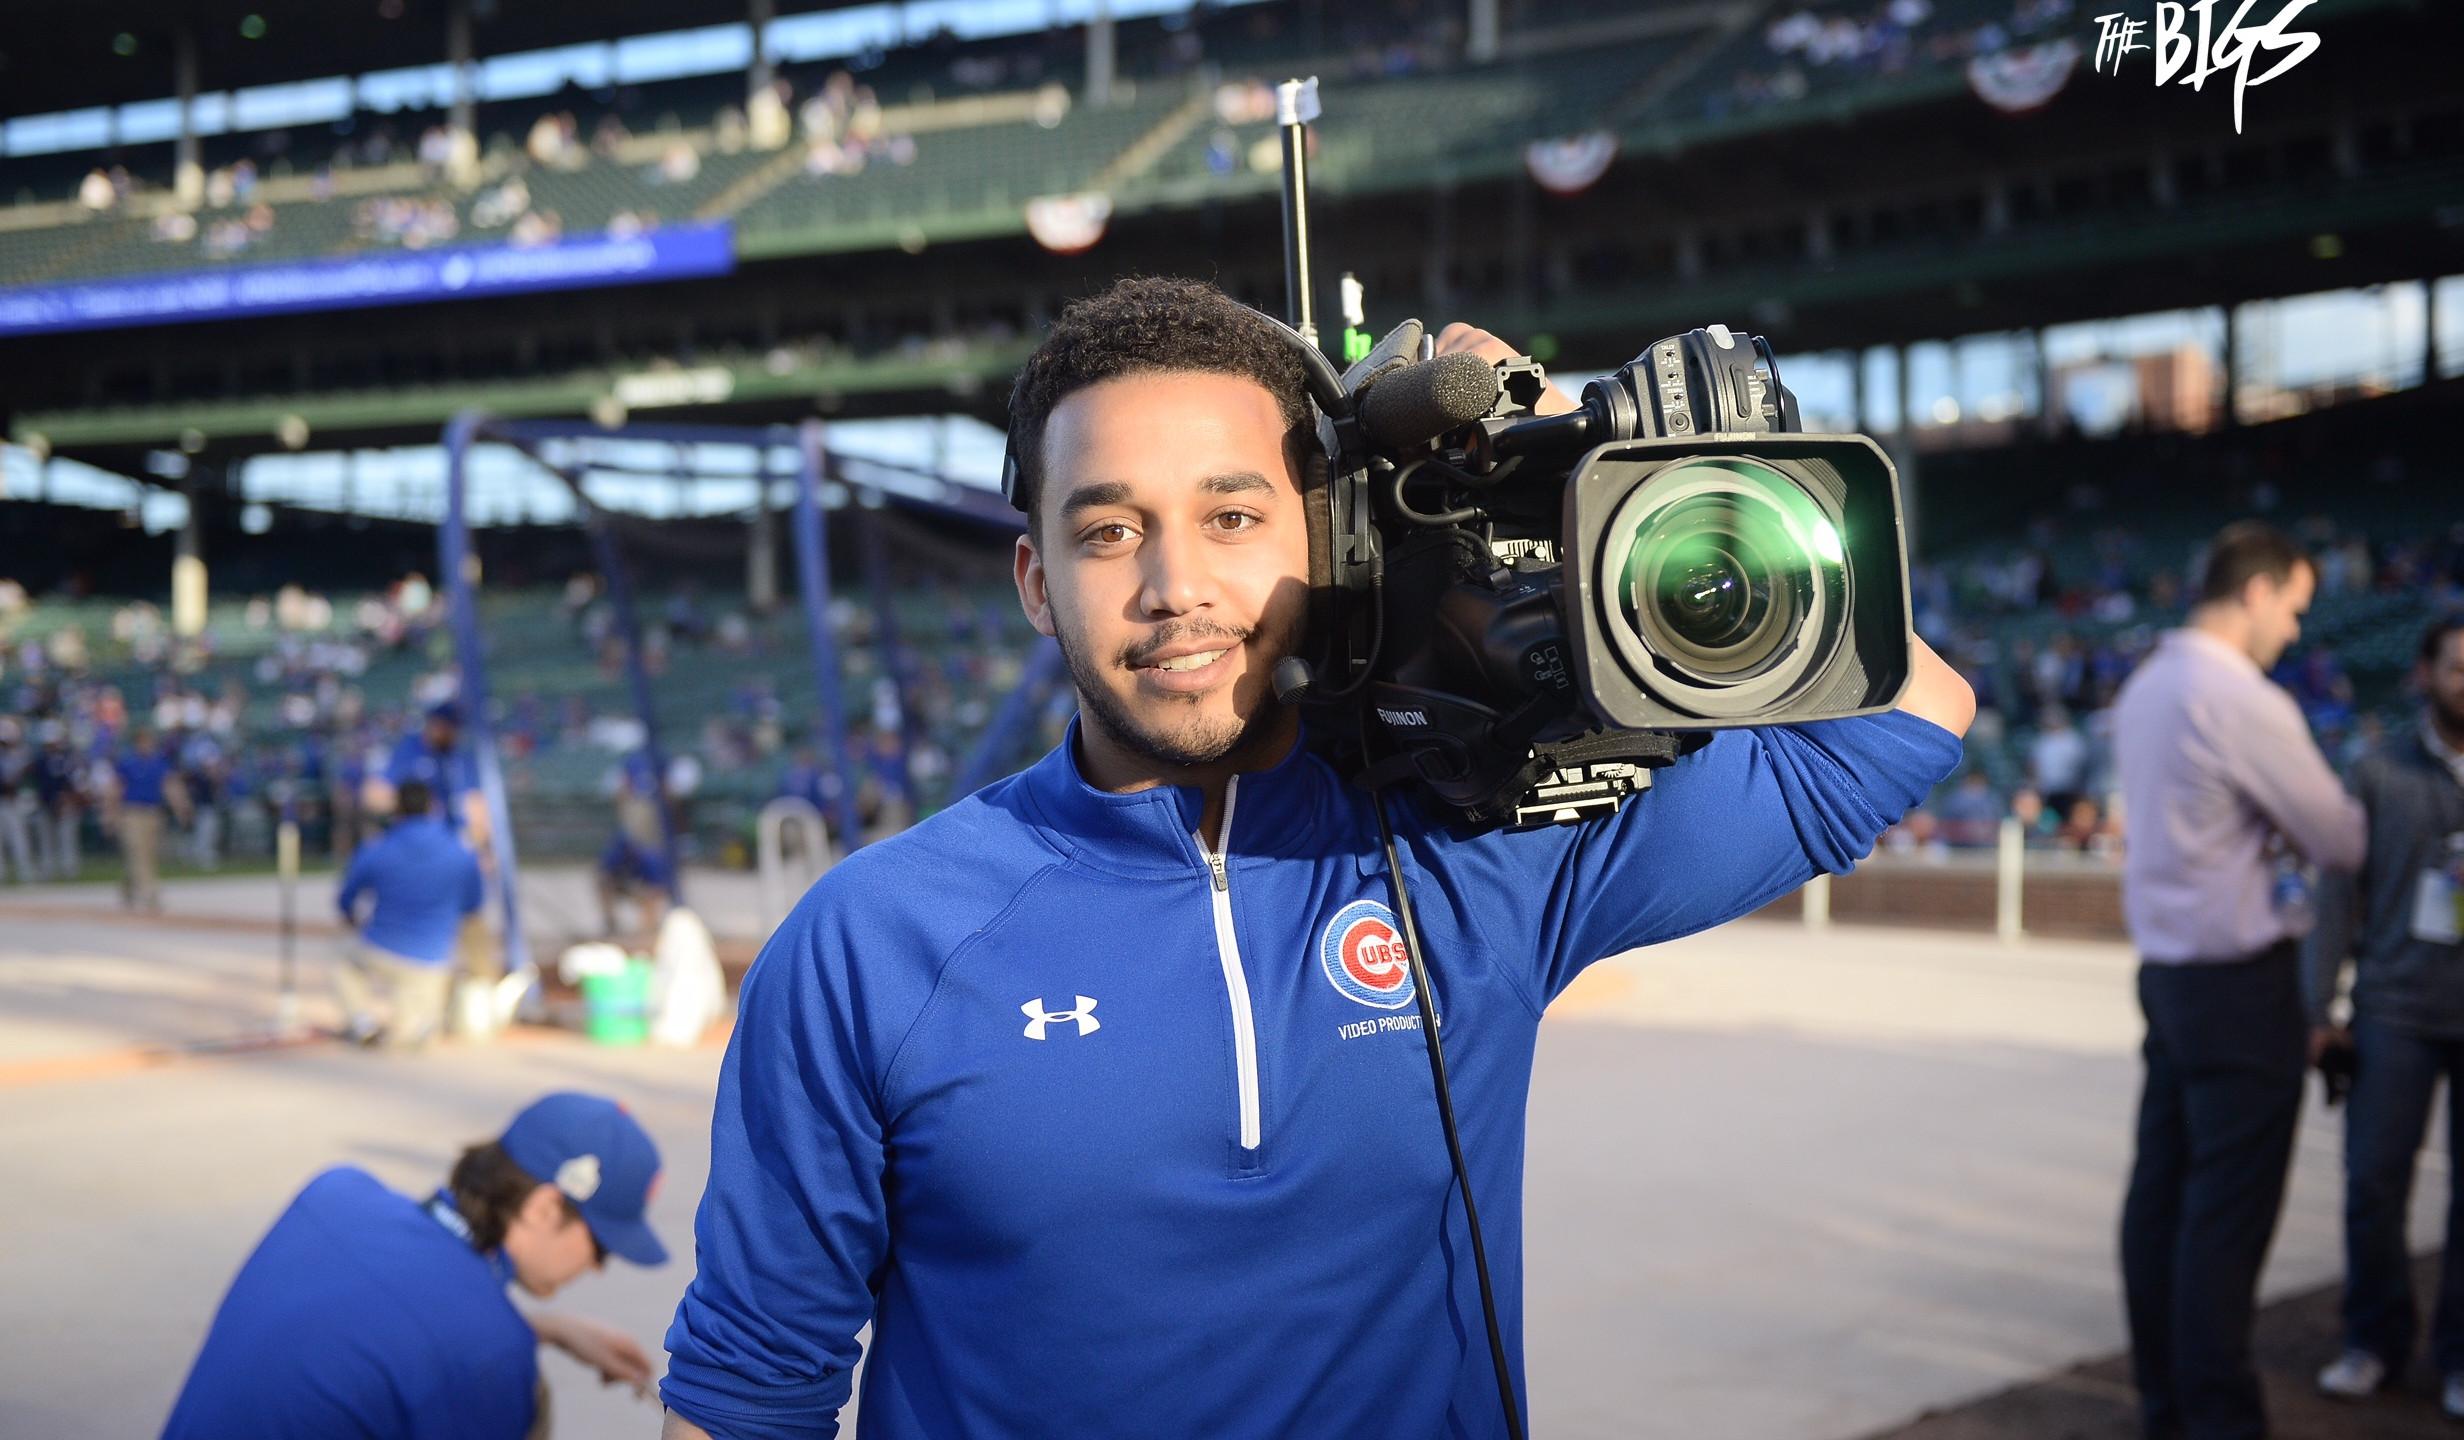 Cubs Camera Guy